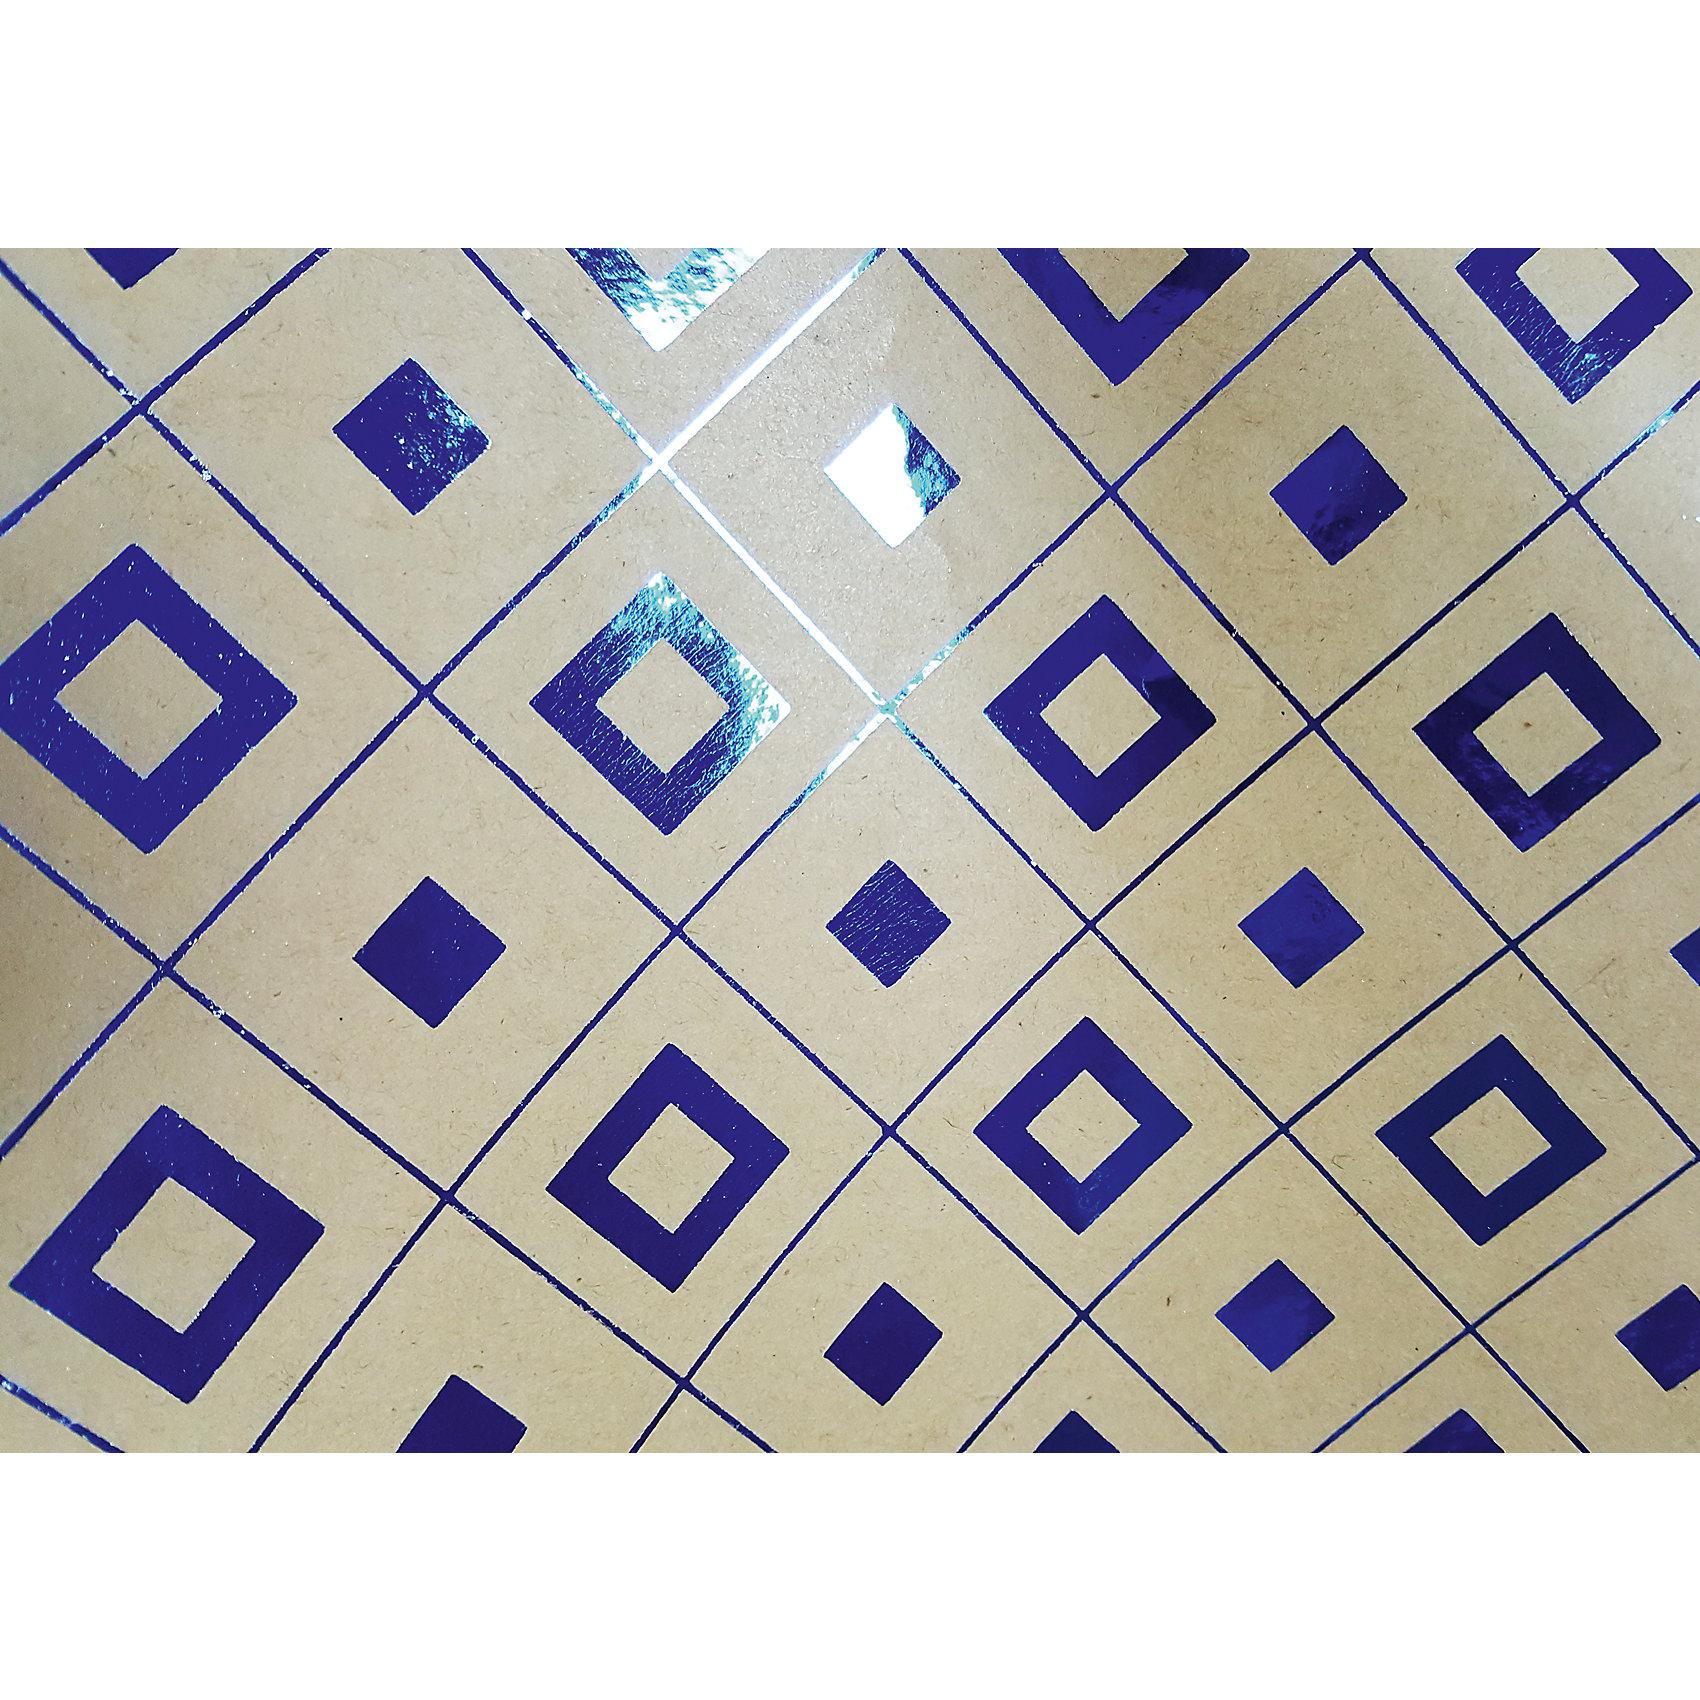 Крафт бумага Синяя геометрия для сувенирной продукции в листах от myToys